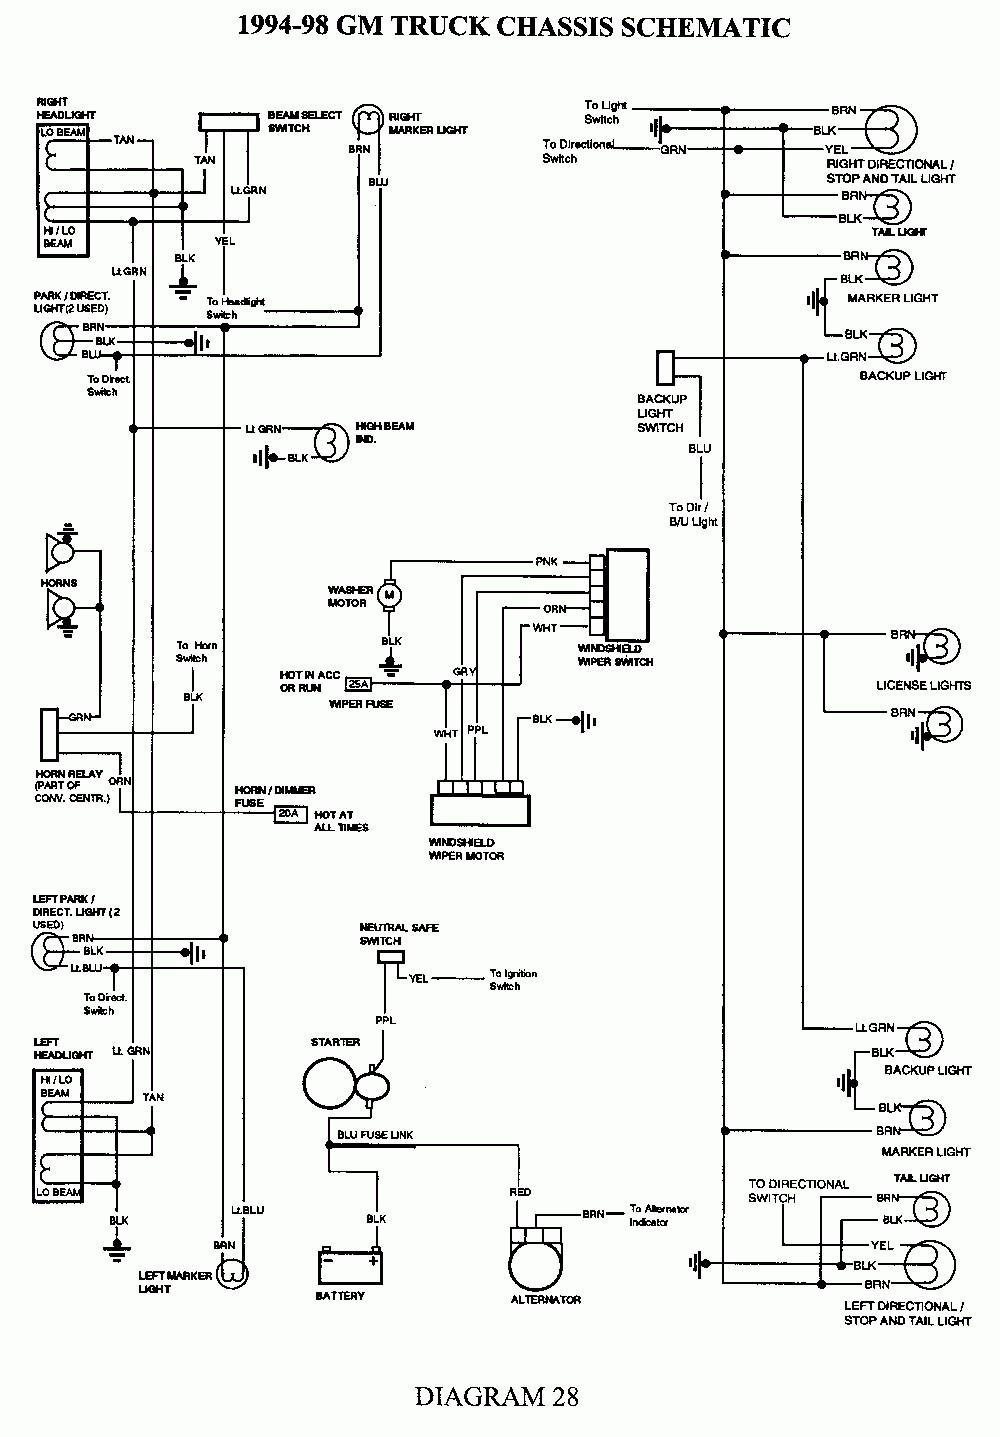 medium resolution of 1991 chevrolet suburban wiring diagram wiring library 2004 sierra wiring diagram 1991 chevrolet suburban headlight wiring